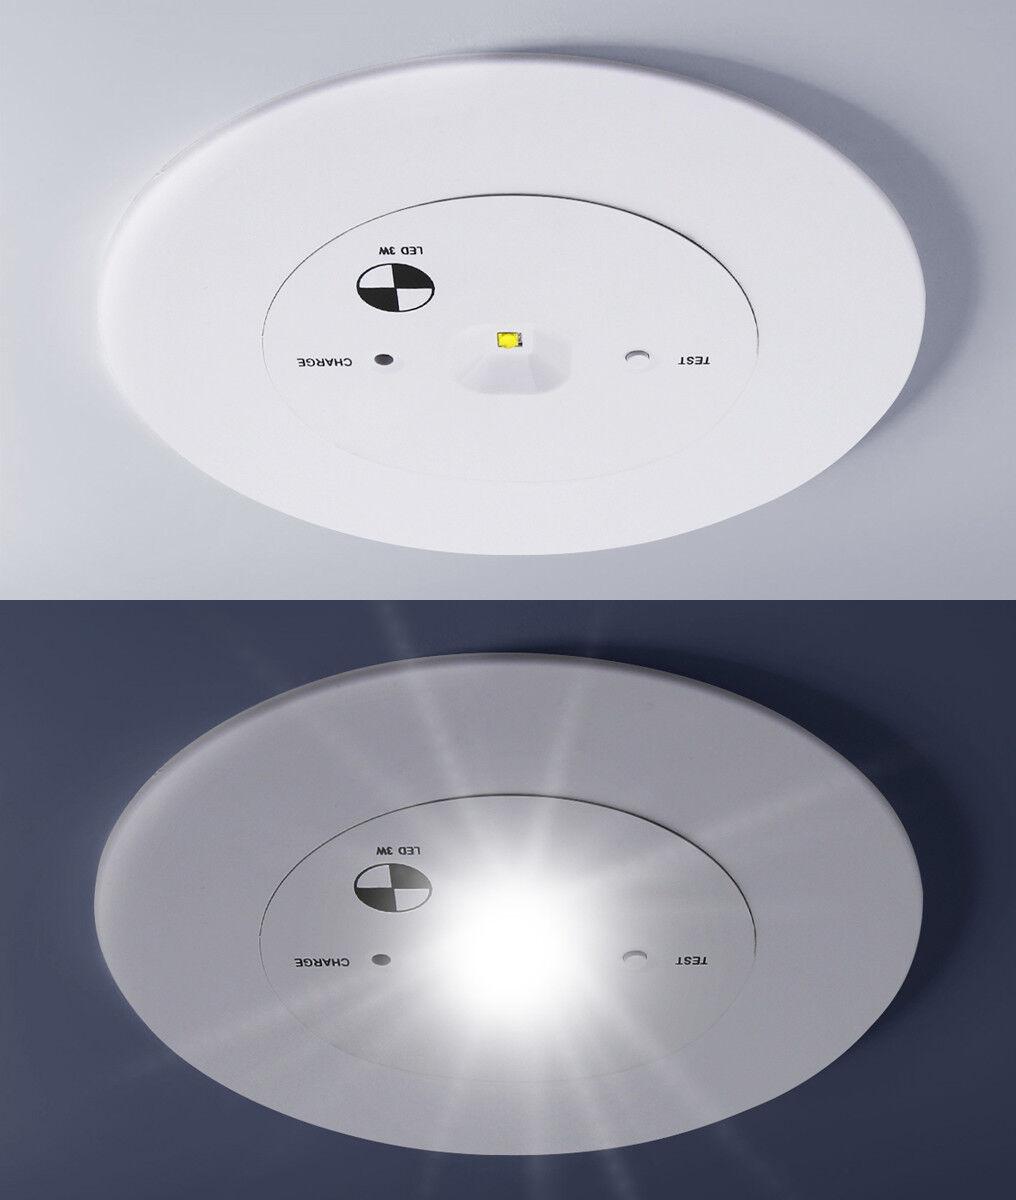 Led Recessed Round Emergency Exit Light Slimline Panel Non Maintained Eml03 Ebay